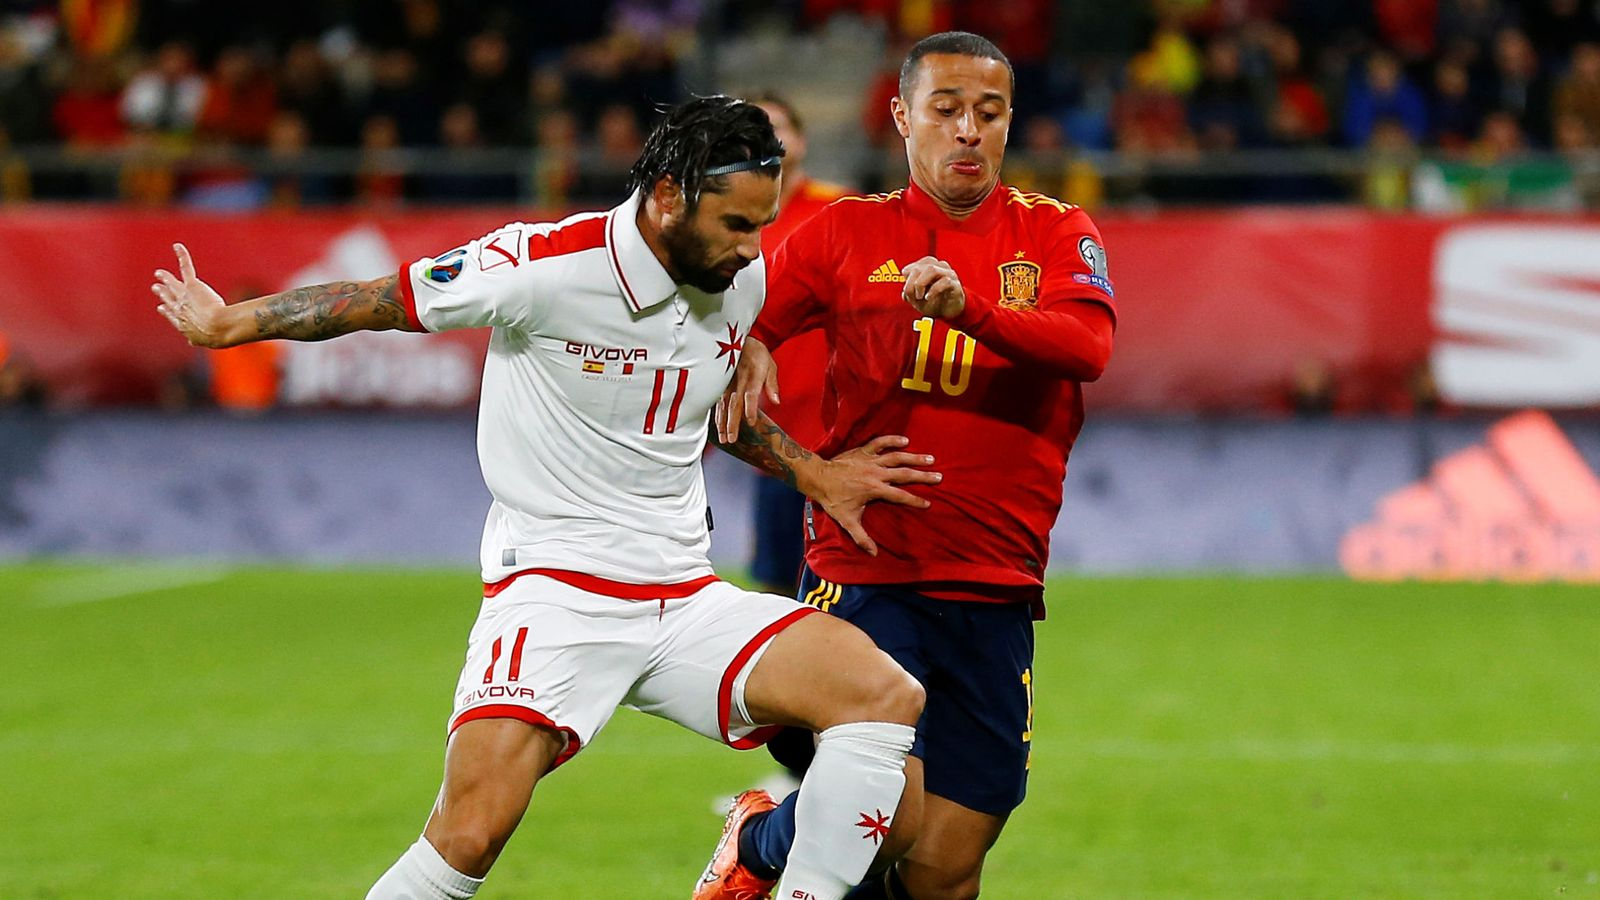 Foto: Euro 2020 qualifier - group f - spain v malta